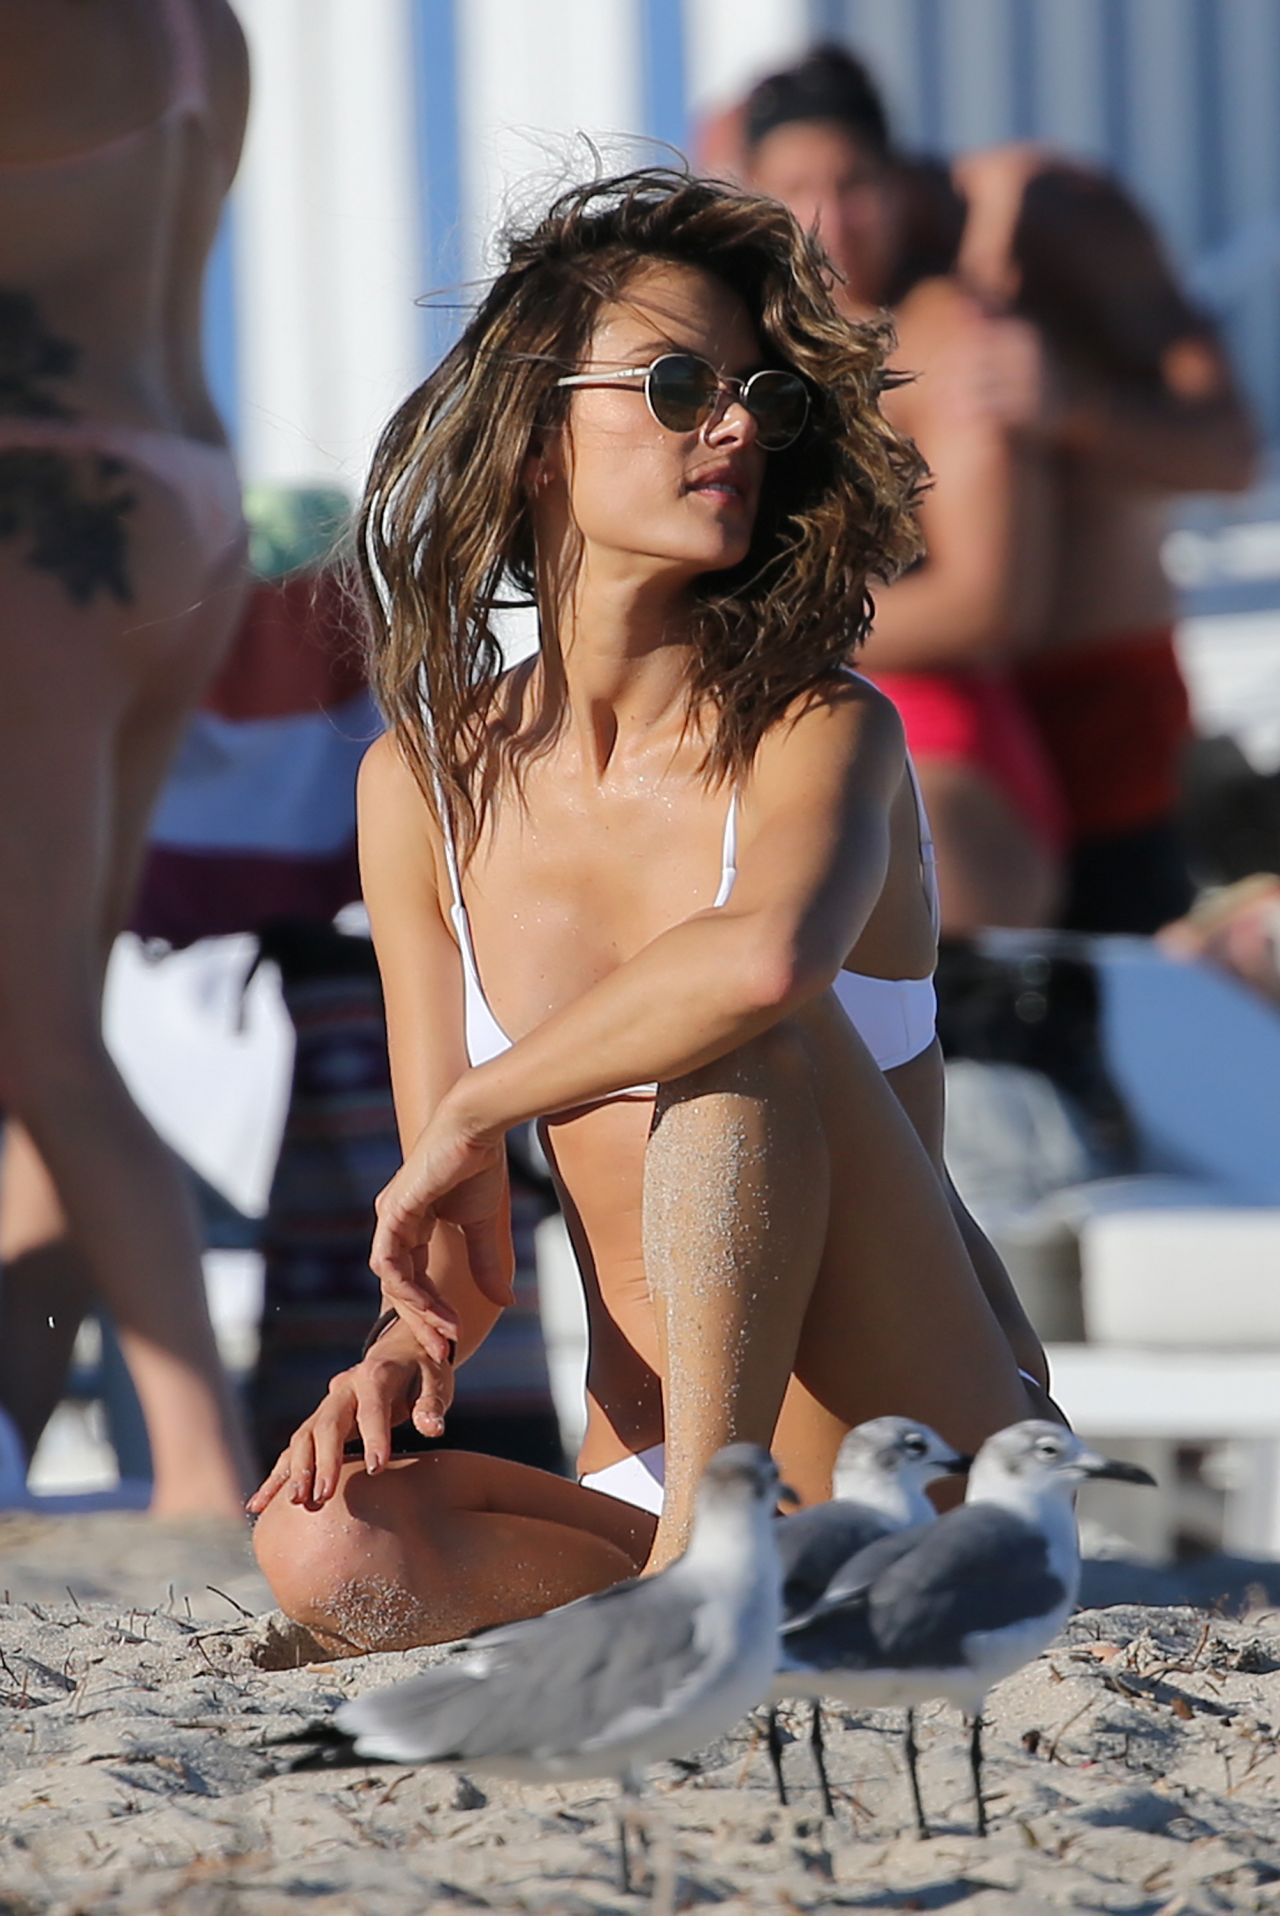 ALESSANDRA AMBROSIO in Bikini at a Beach in Malibu 05/28